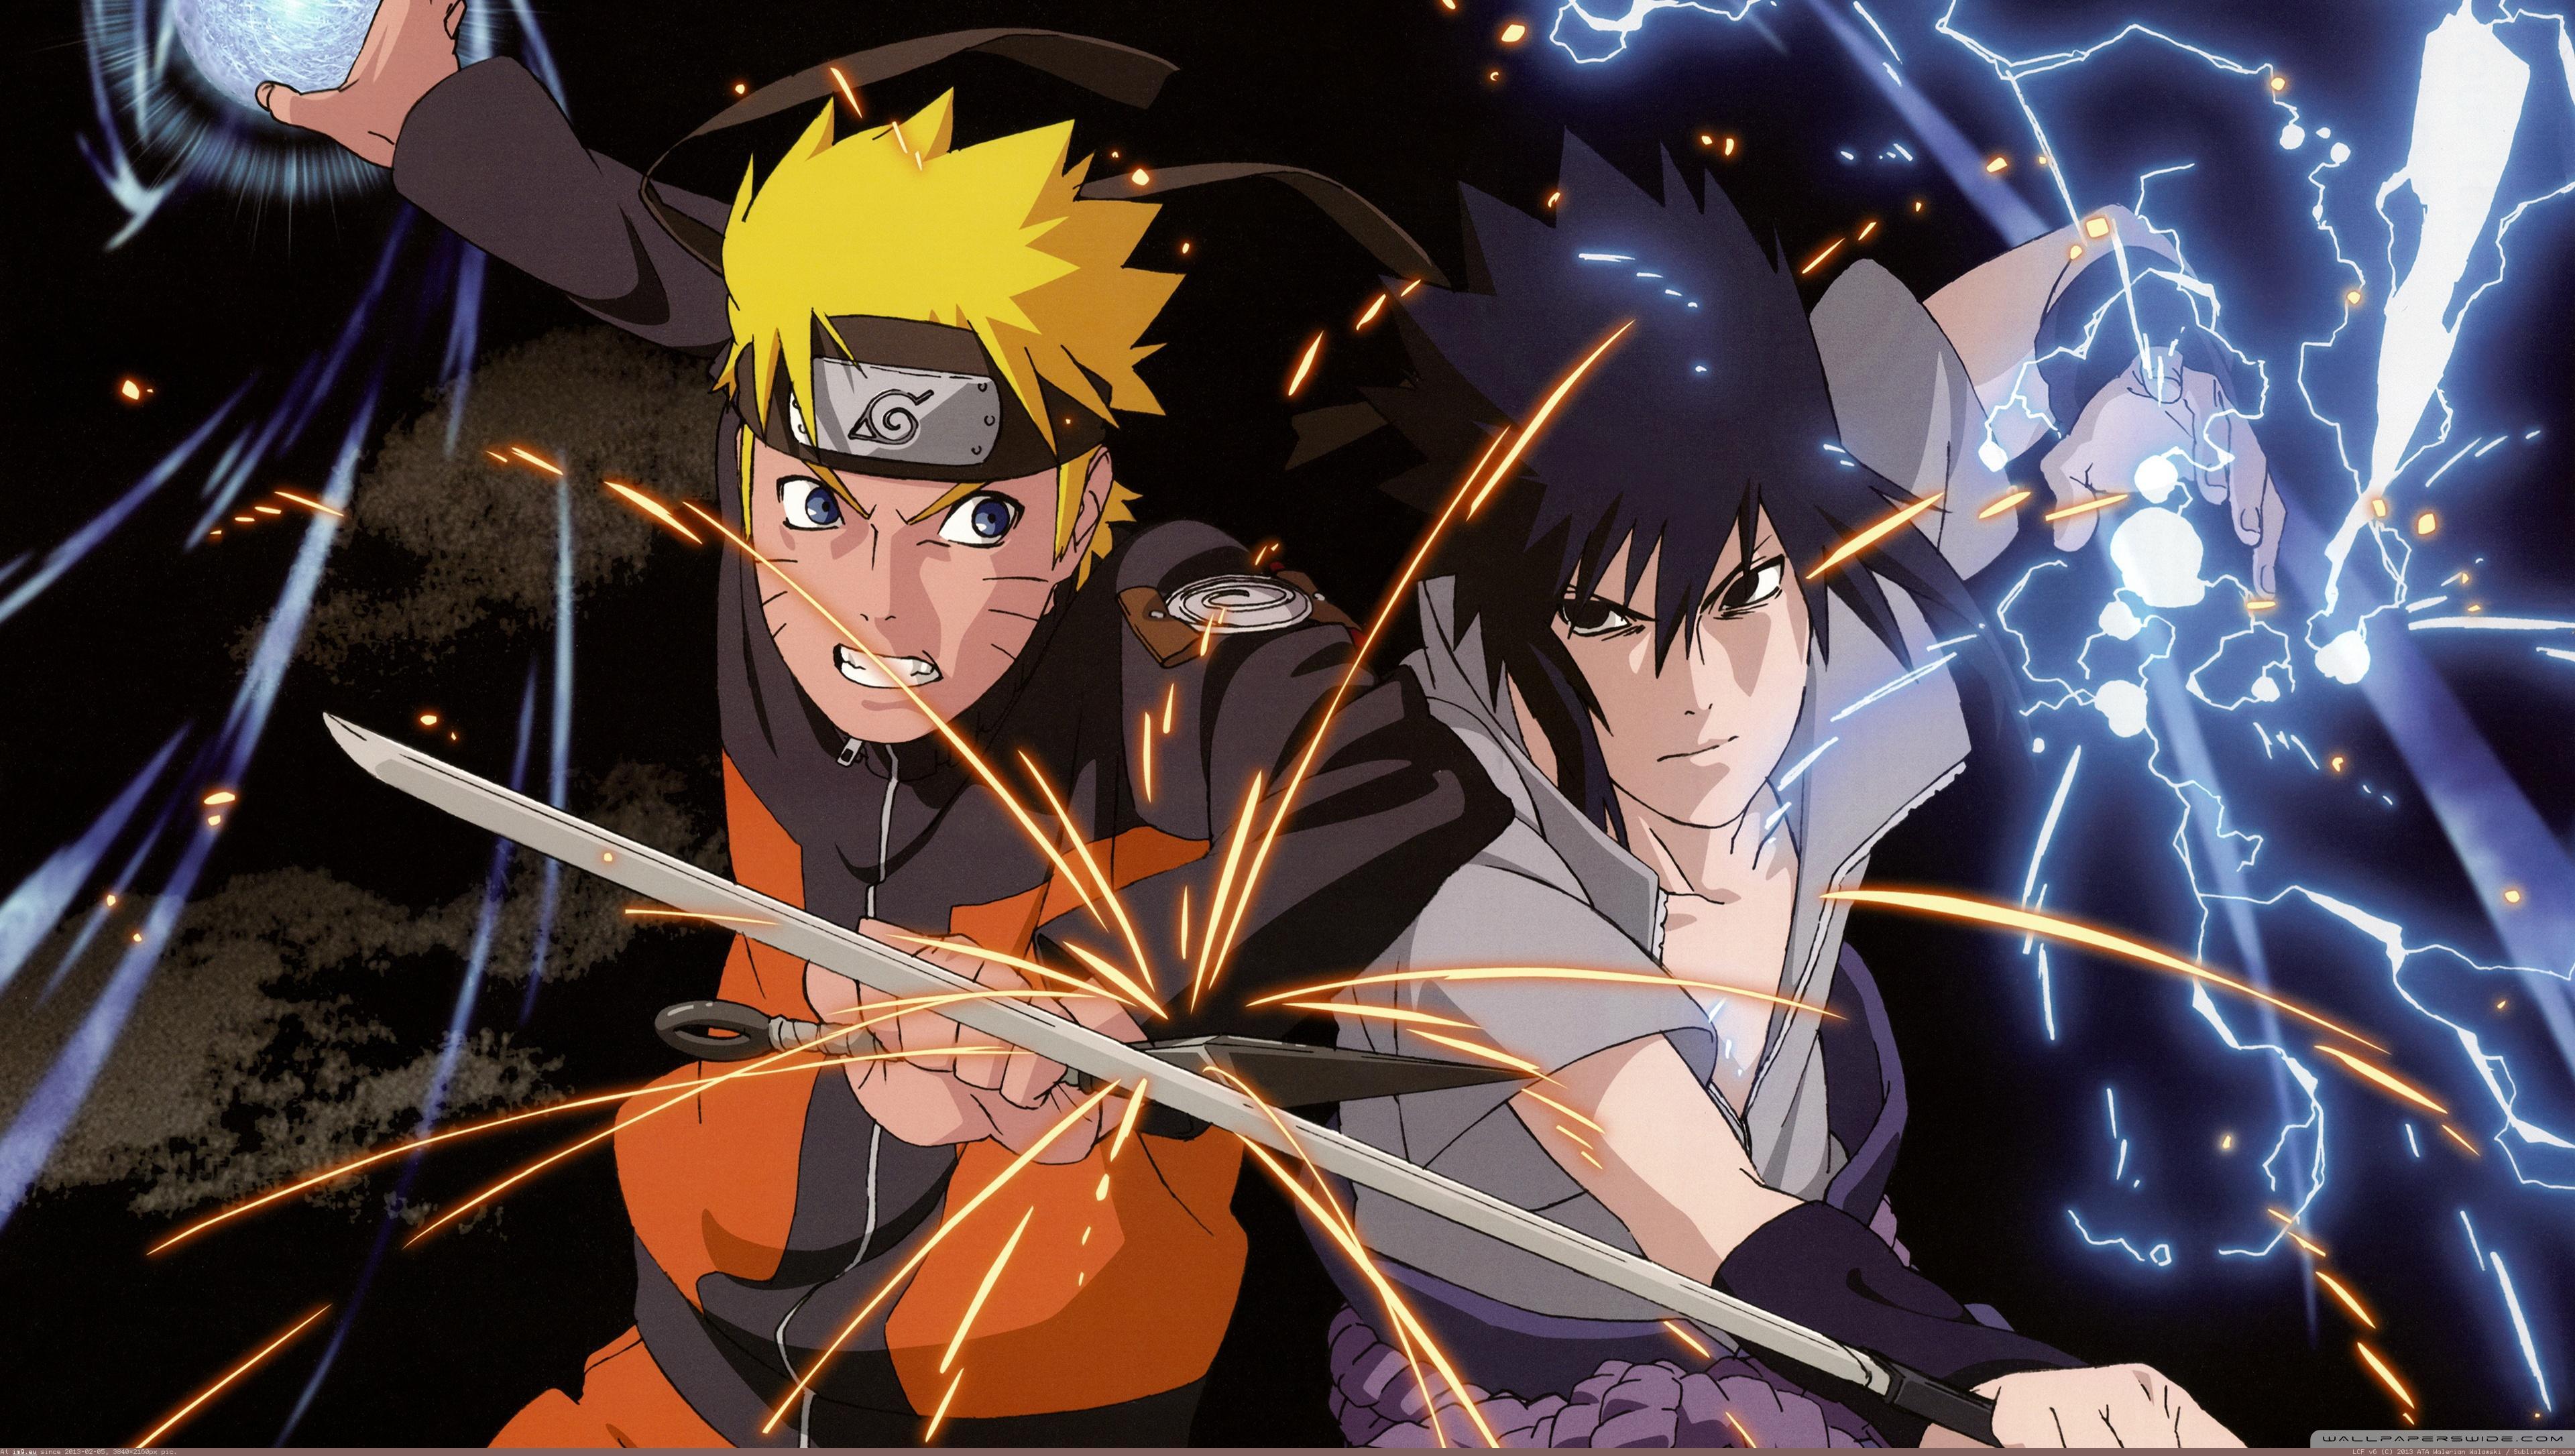 art3D backgrounds Naruto Vs Sasuke Wallpaper 3840X2160 HD 3840x2172